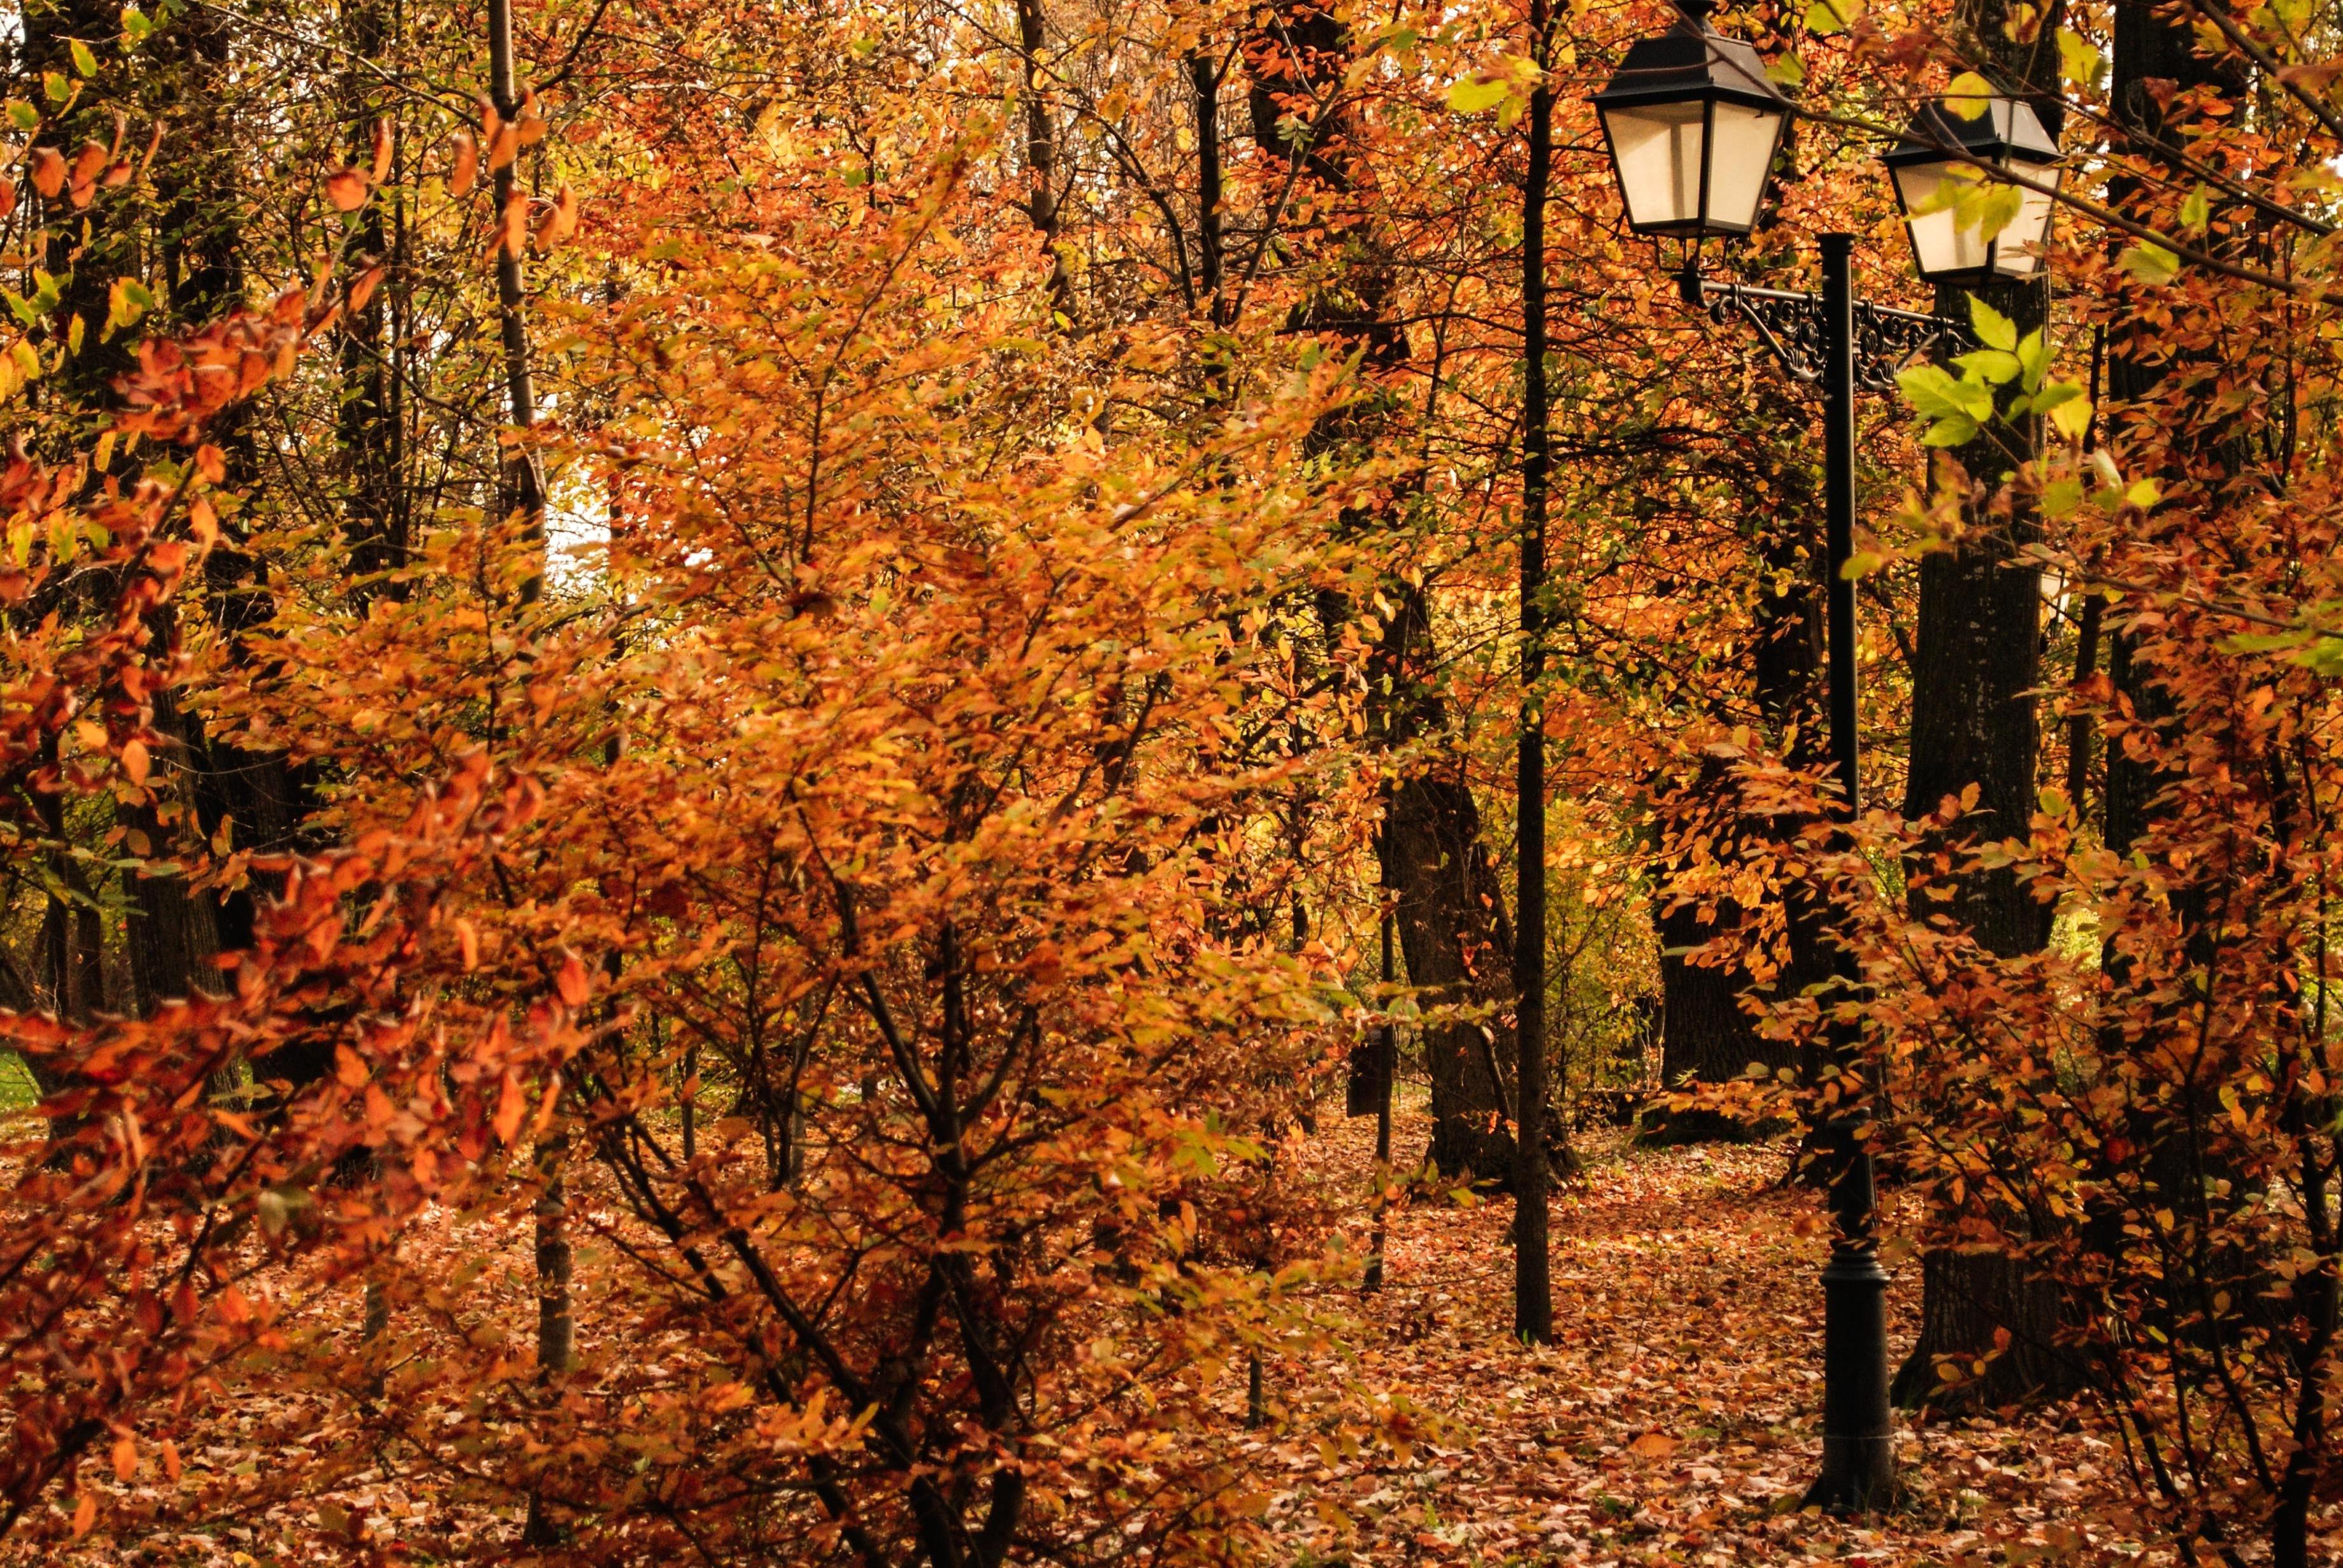 Fall Foliage Computer Wallpaper Image Libre Feuille Bois Arbre Nature Paysage